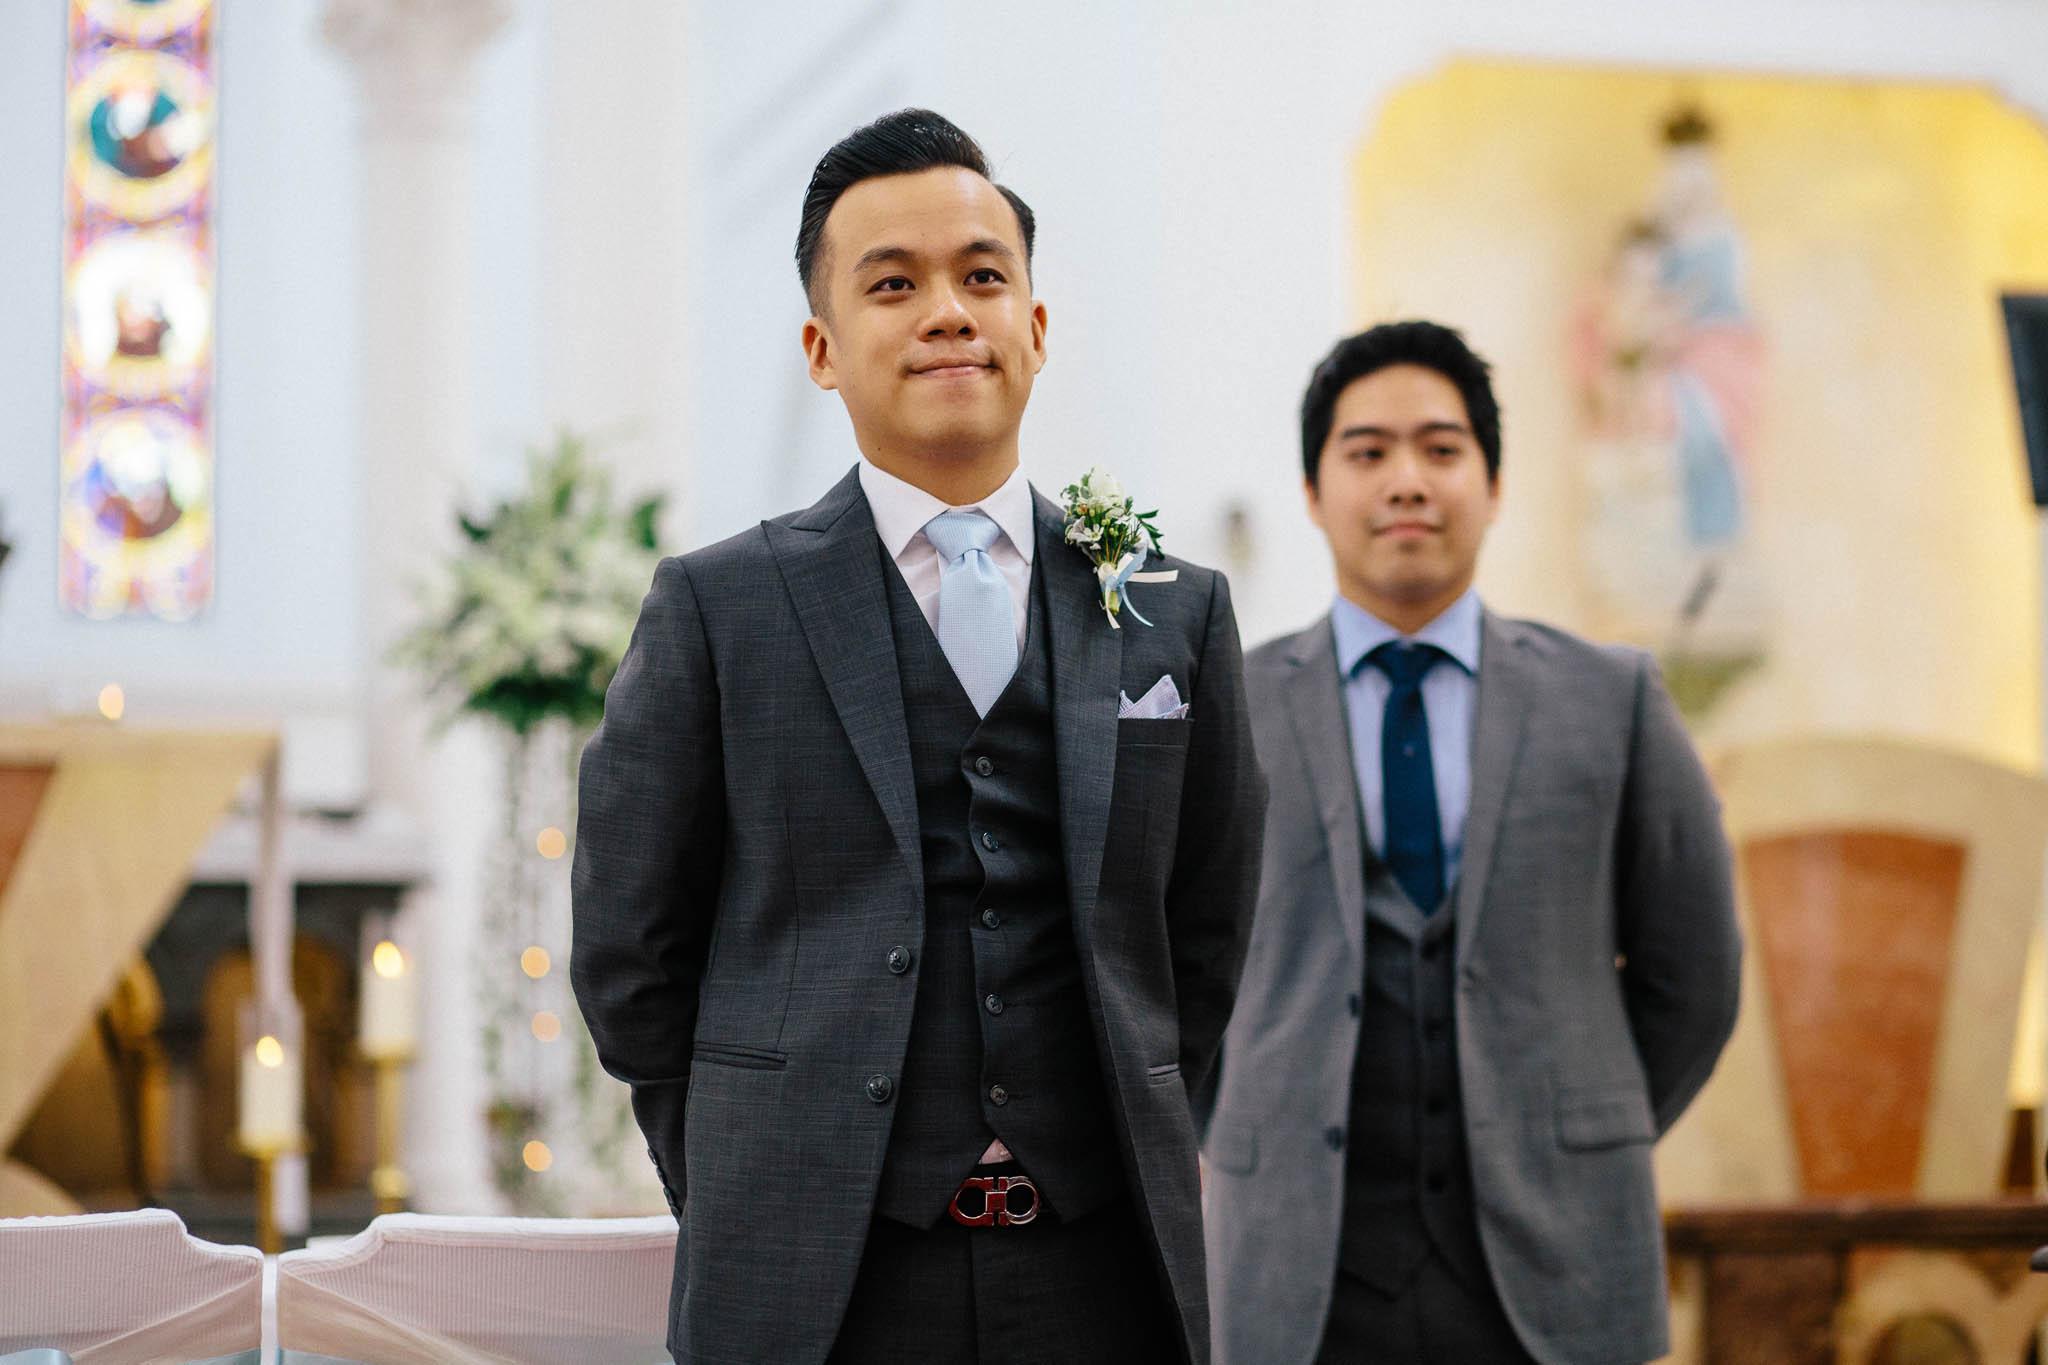 singapore-wedding-photographer-malay-indian-pre-wedding-travel-wmt-2015-jeremy-larissa-27.jpg